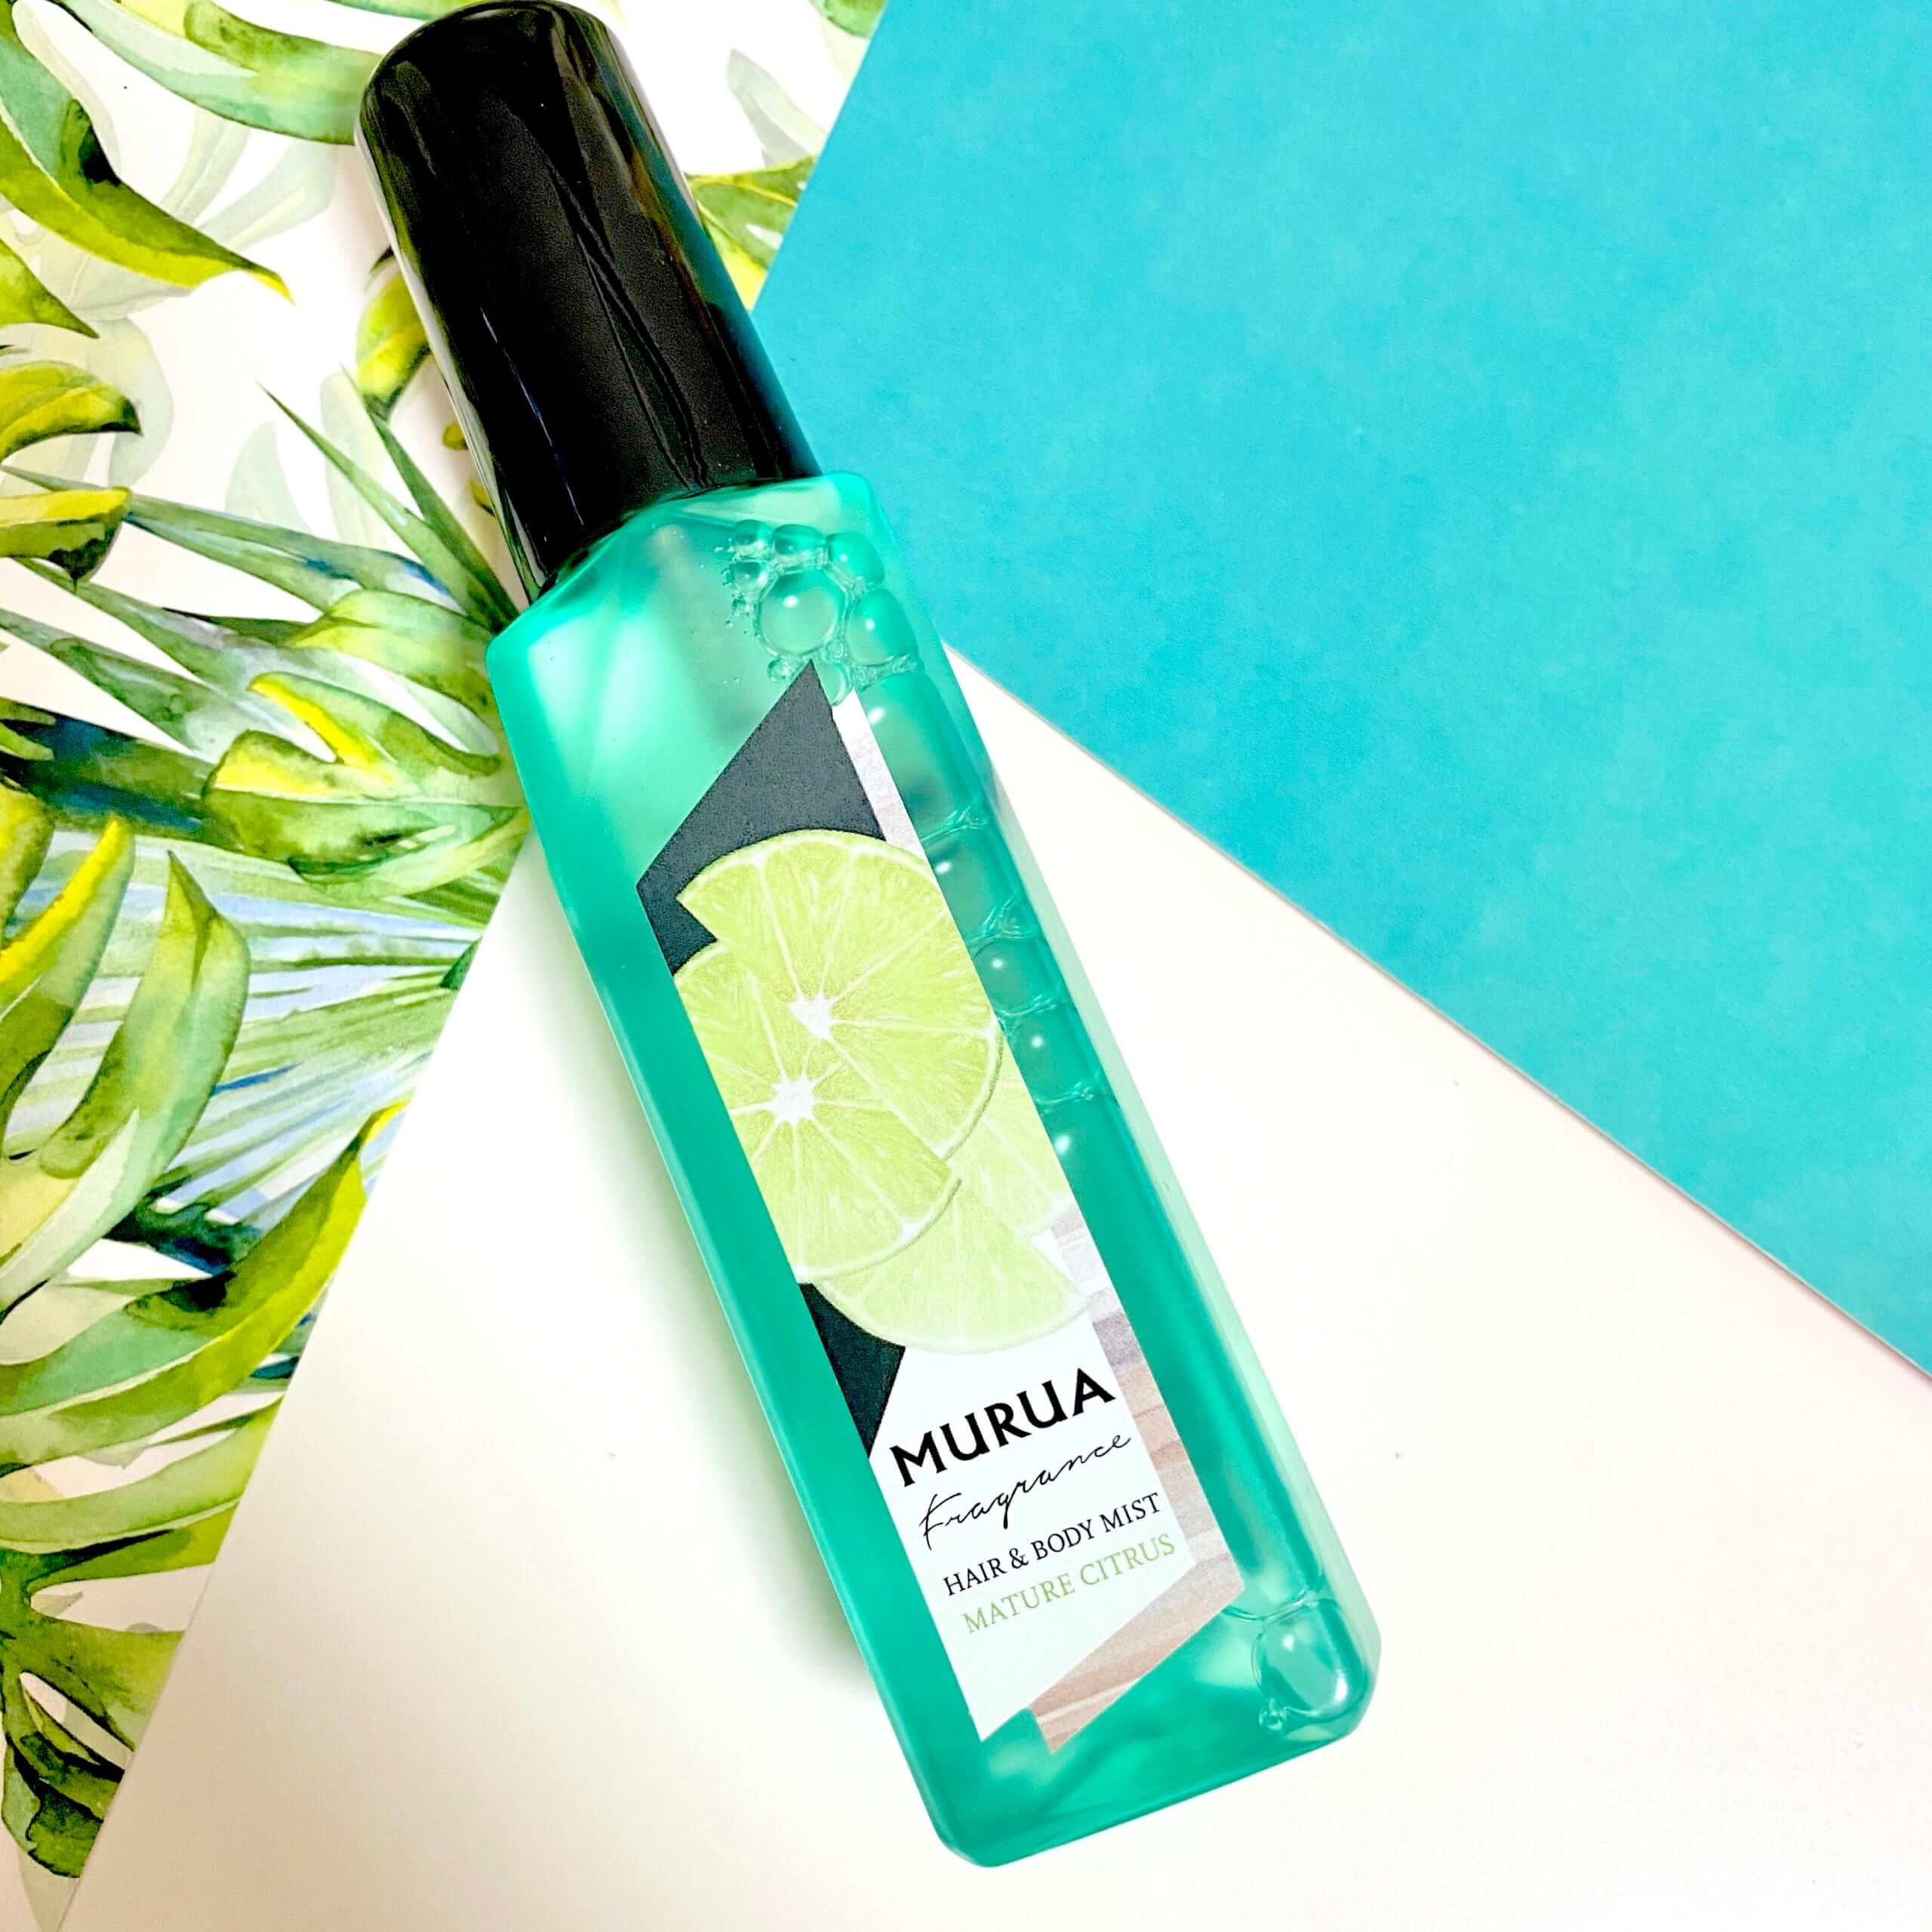 MURUA Fragrance(ムルーア フレグランス) マチュアシトラス